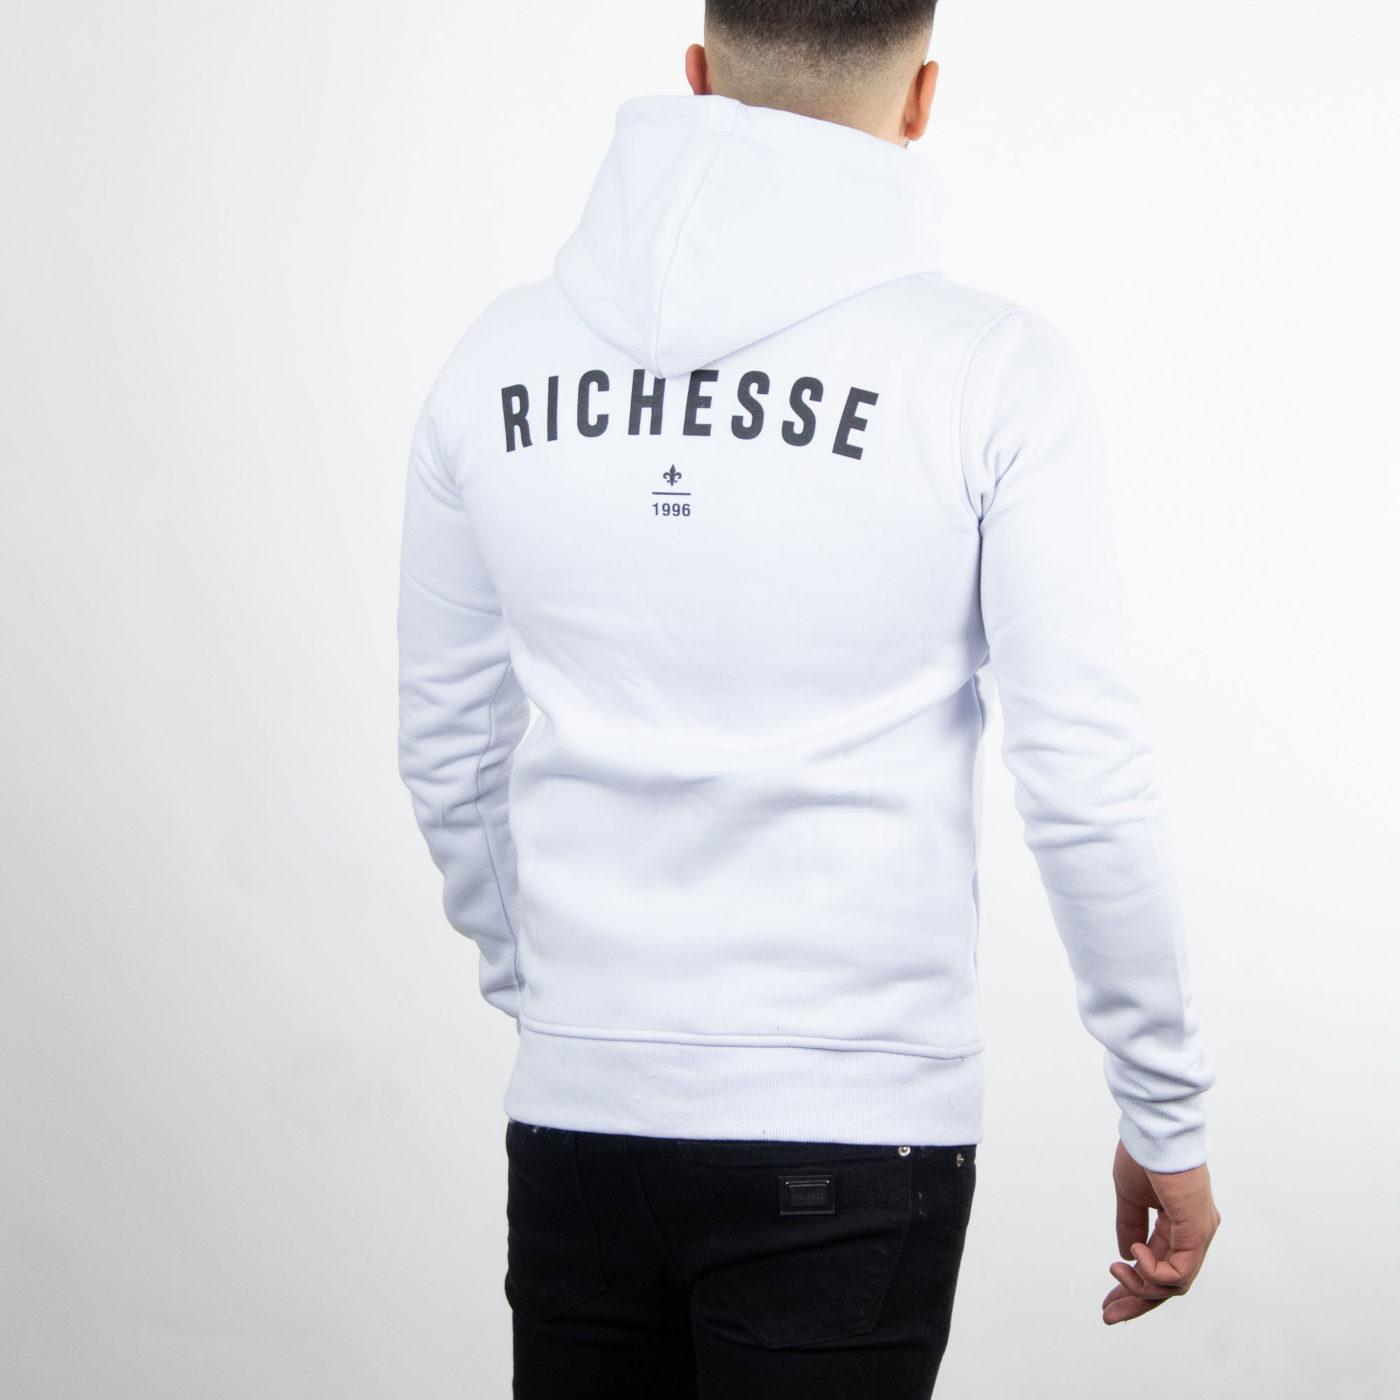 Richesse-Brand-Back-White-4